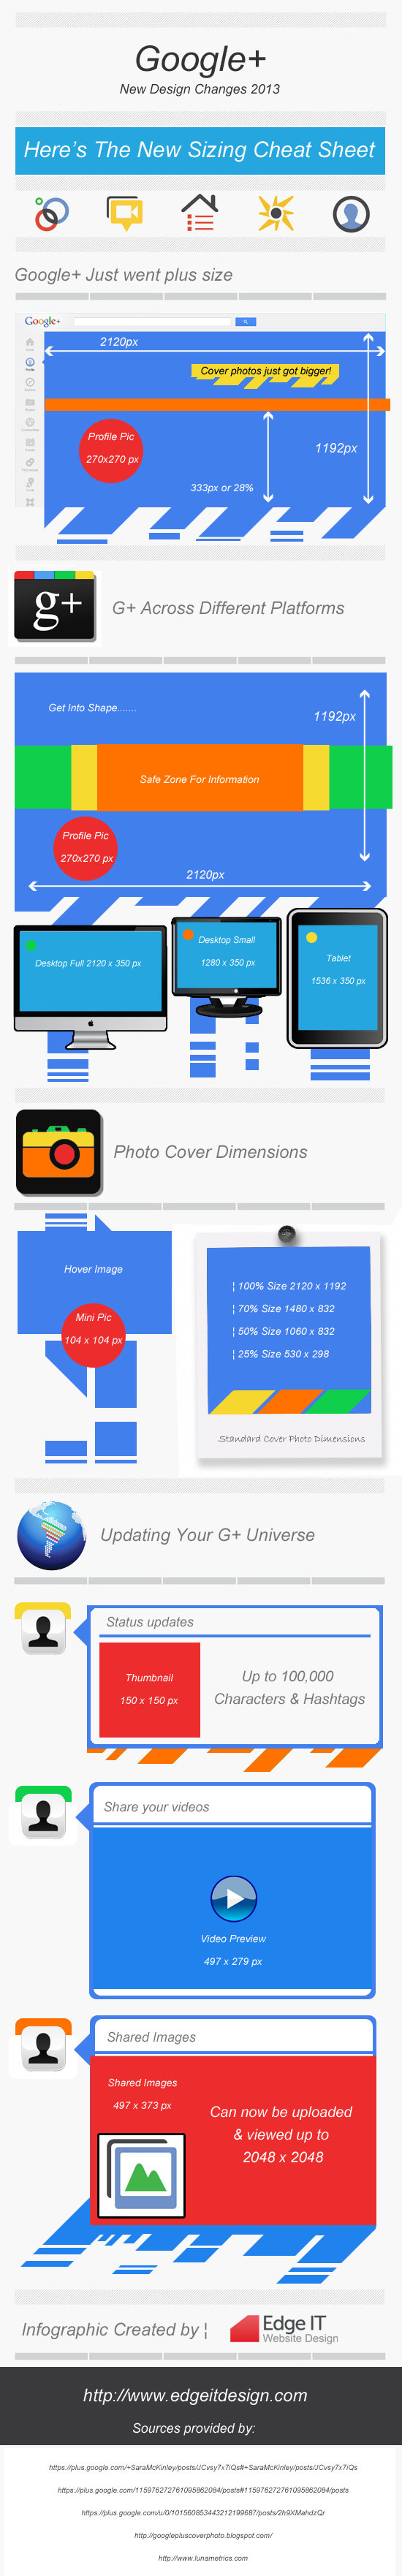 google plus design cheat sheet #Infographic